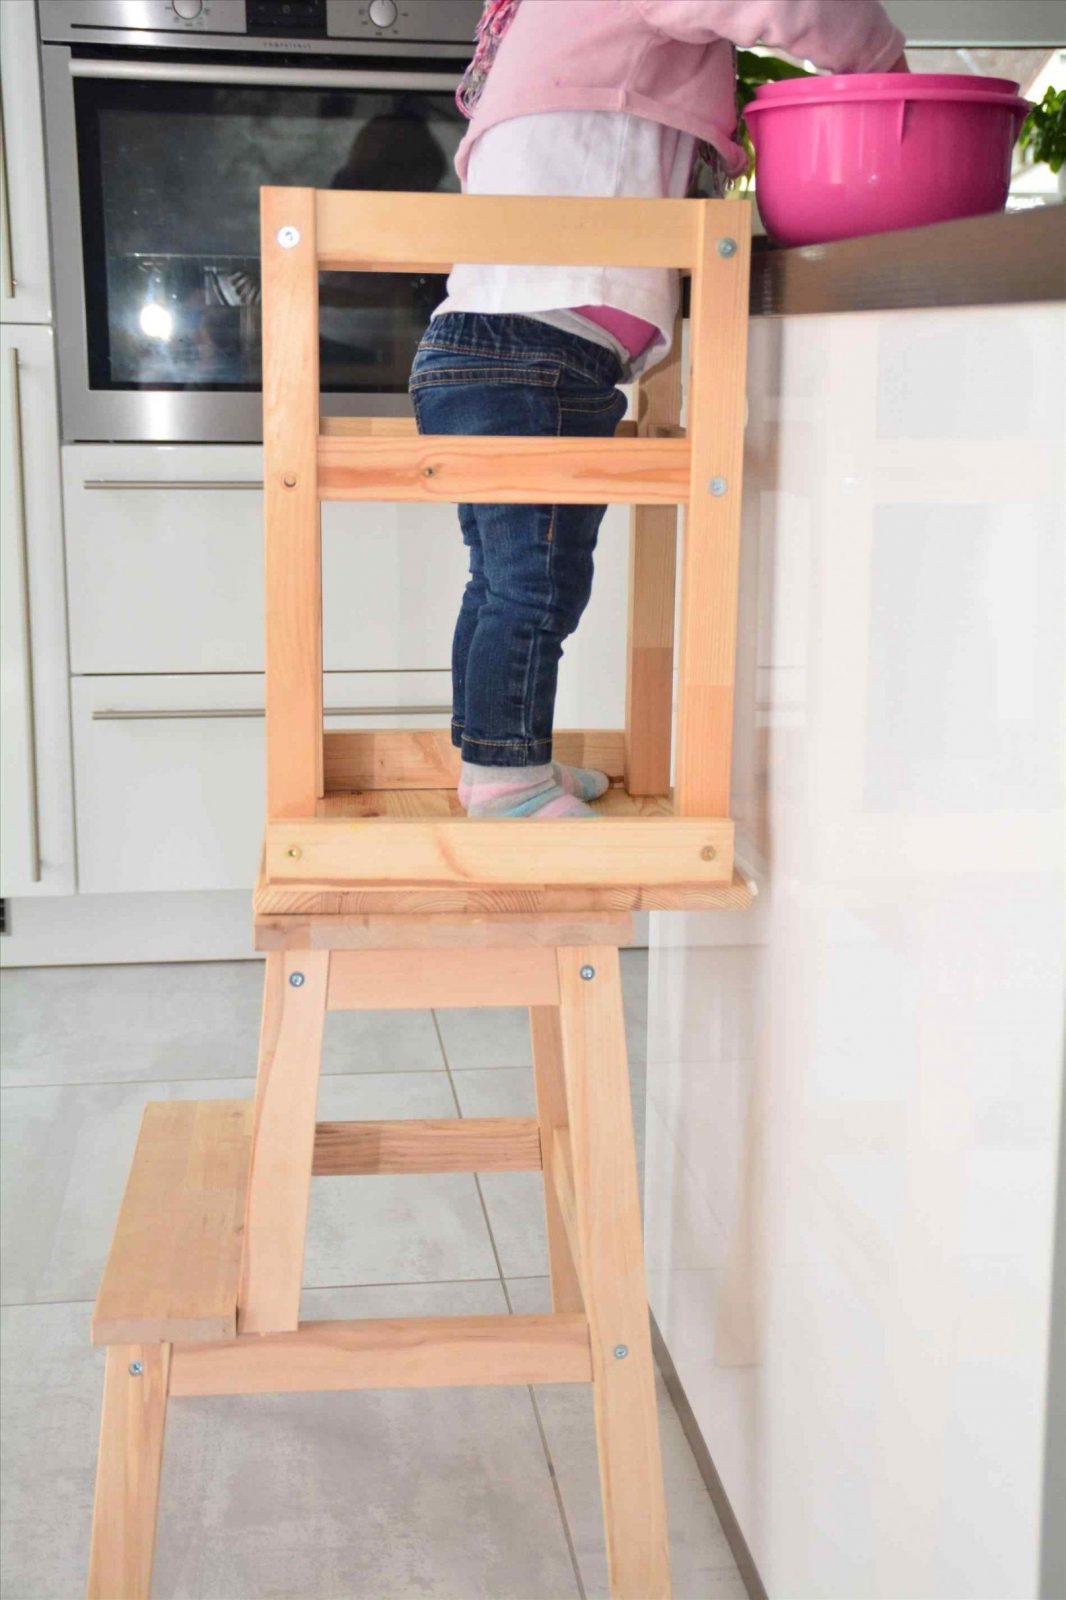 Sitzbank selber machen perfect sitzbank selber bauen - Sitzbank ruckenlehne wand ...